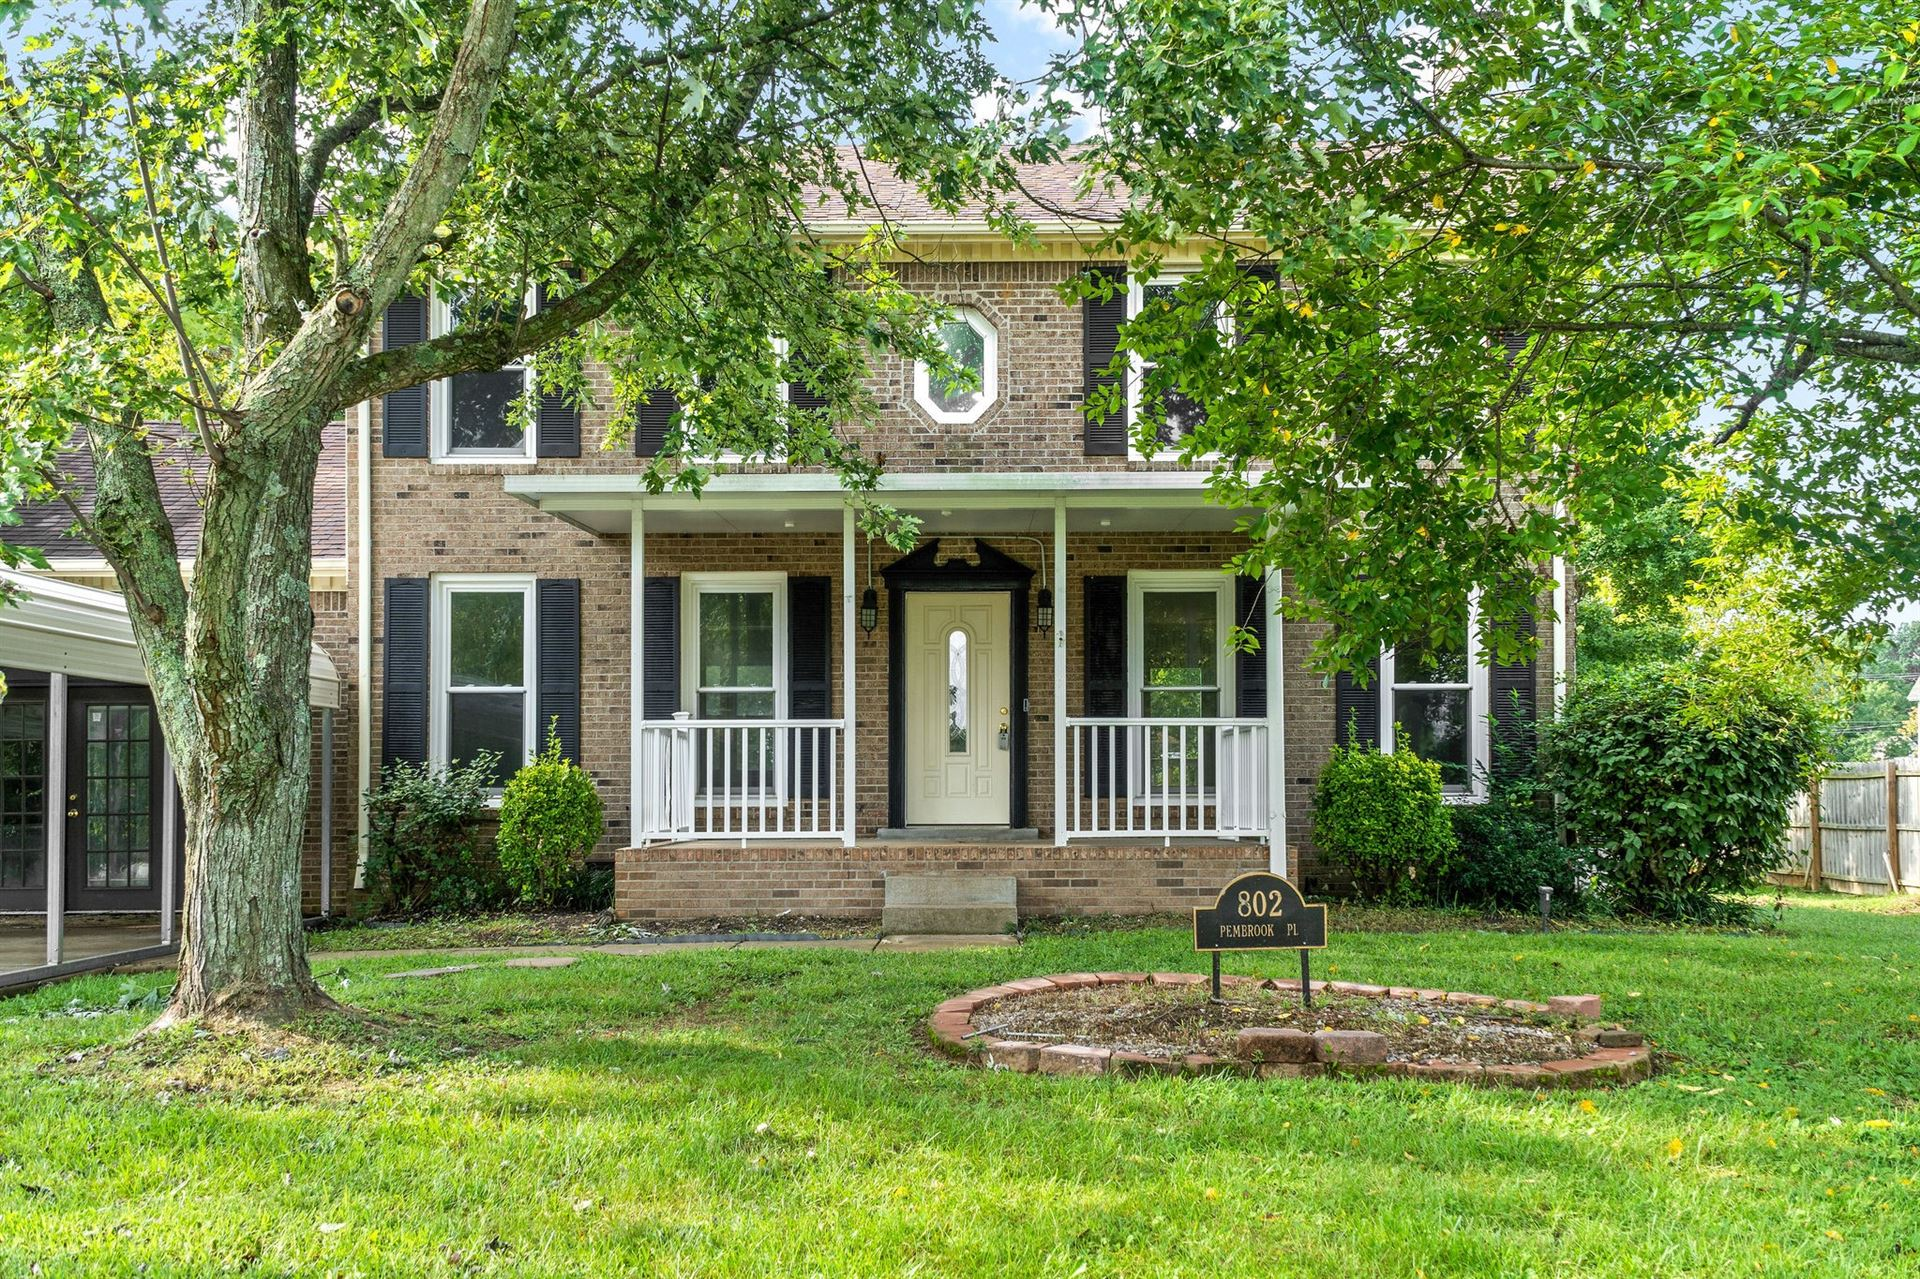 802 Pembrook Pl, Clarksville, TN 37042 - MLS#: 2292233